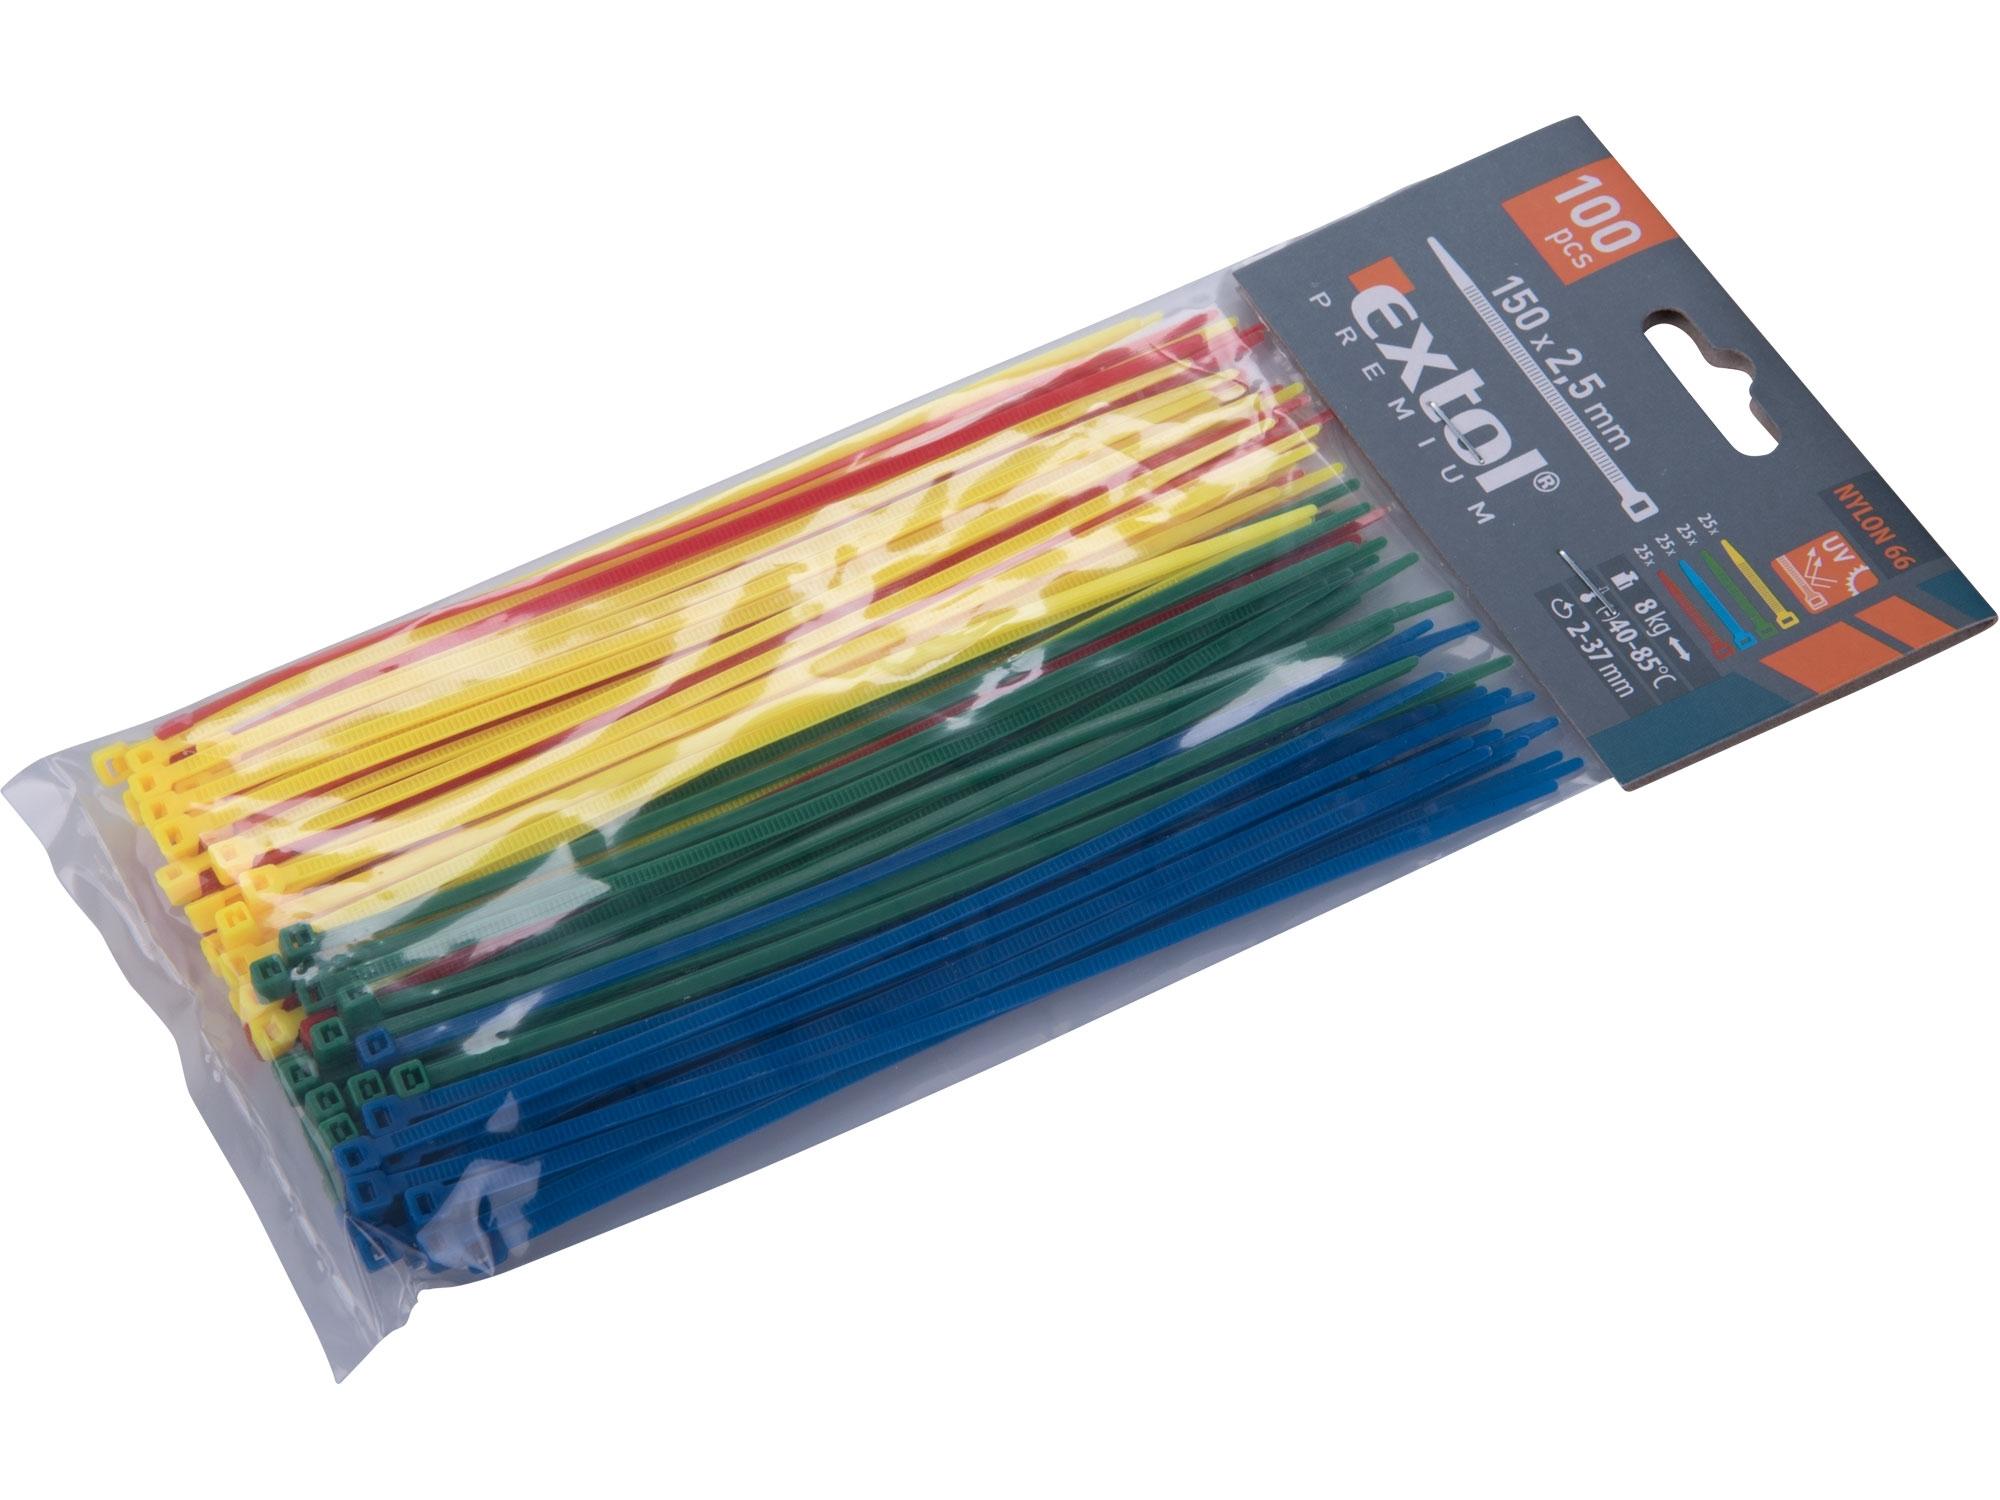 pásky stahovací barevné, 150x2,5mm, 100ks, (4x25ks), 4 barvy, nylon, EXTOL PREMIUM 8856194